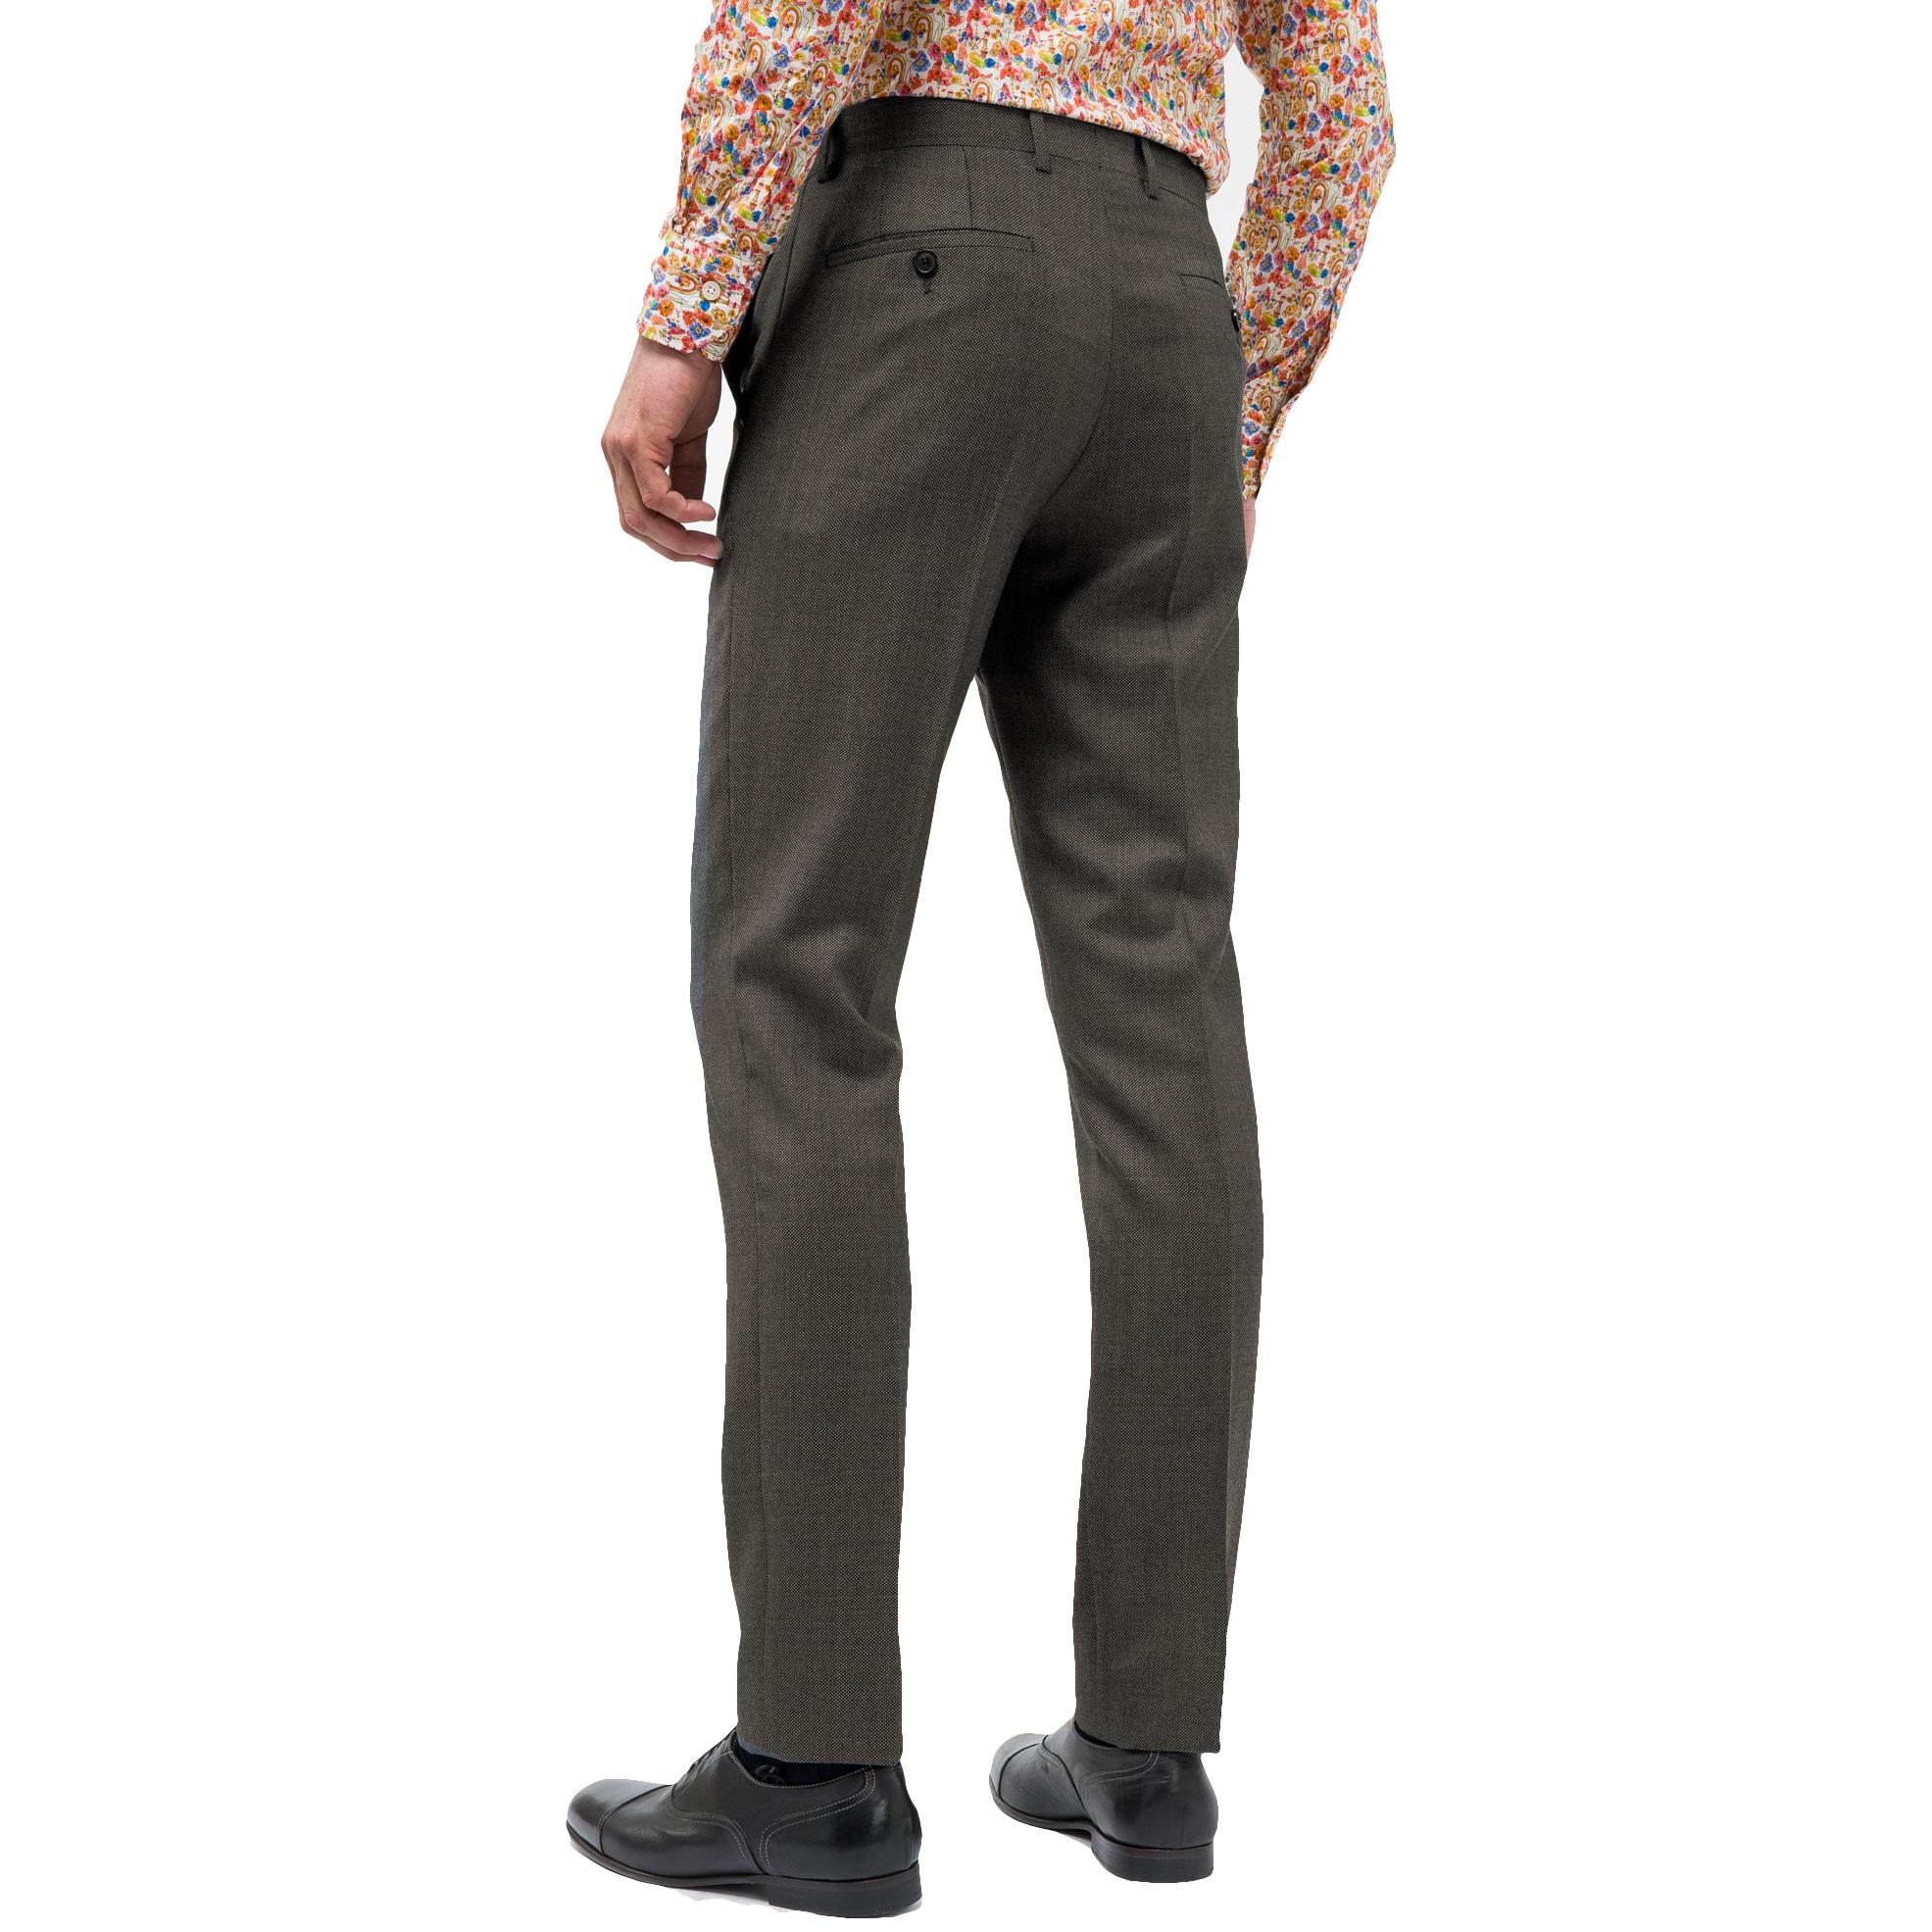 paul smith the soho - mens tailored-fit dark grey birdseye wool suit pspc-1439-w07-e_3.jpg